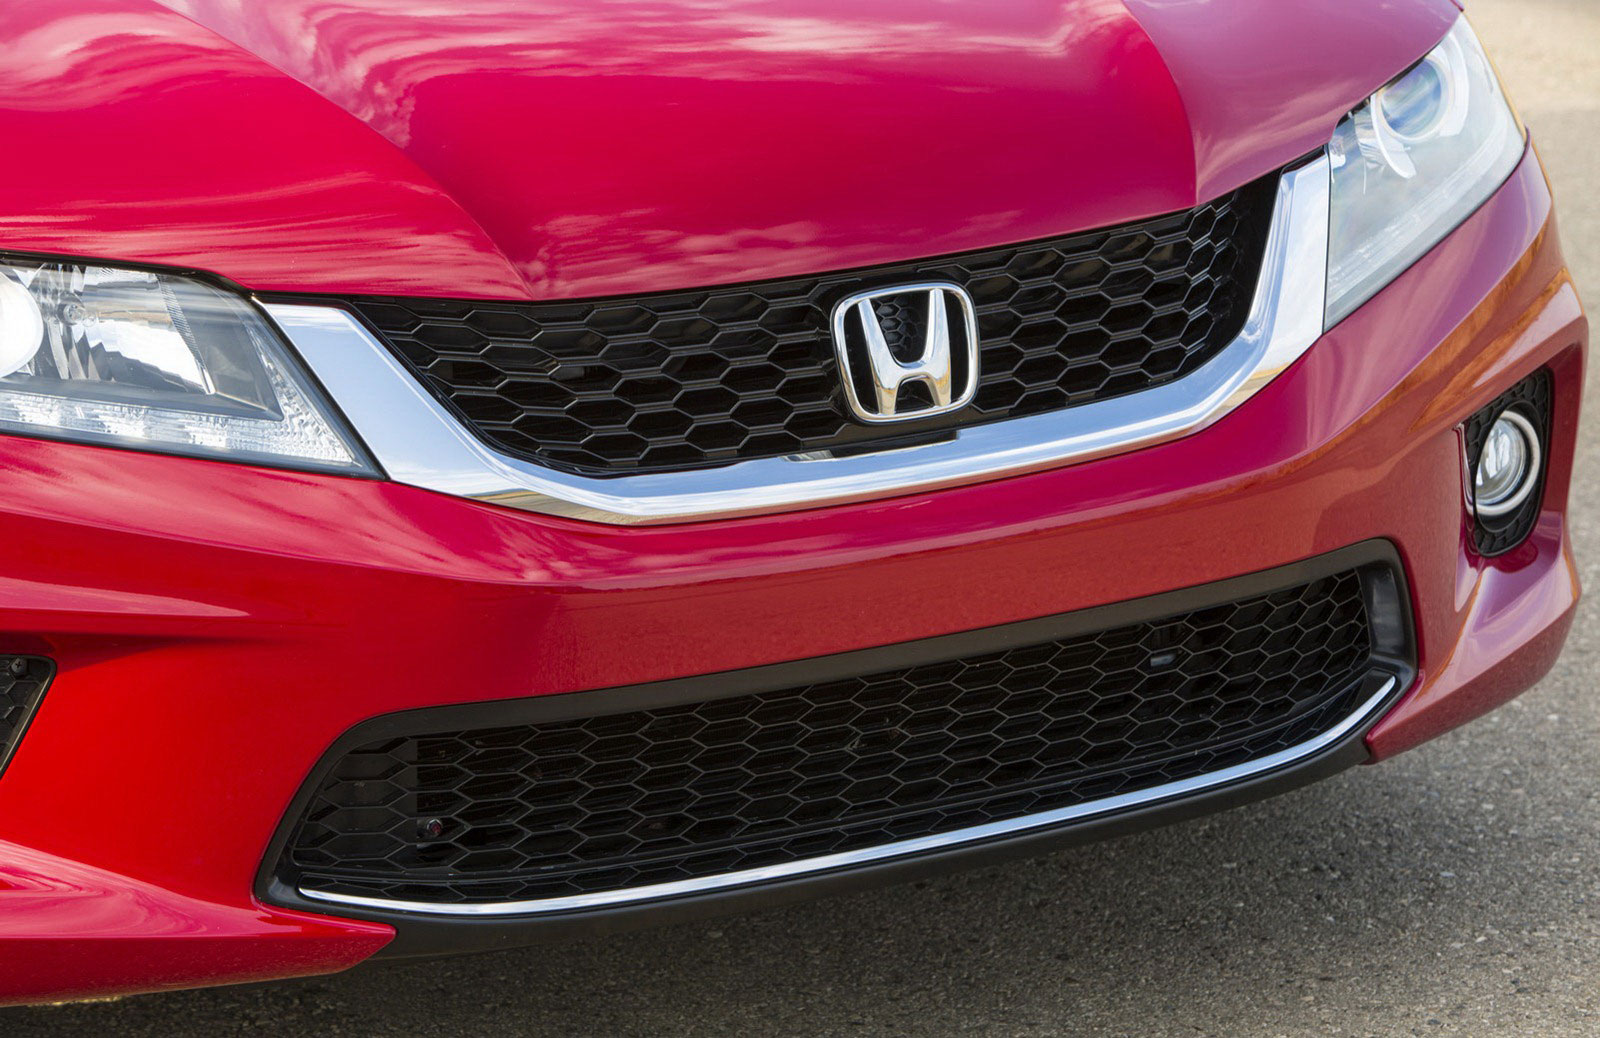 Honda Accord Coupe >> GALLERY: 2013 Honda Accord Coupe looking good Paul Tan - Image 130282